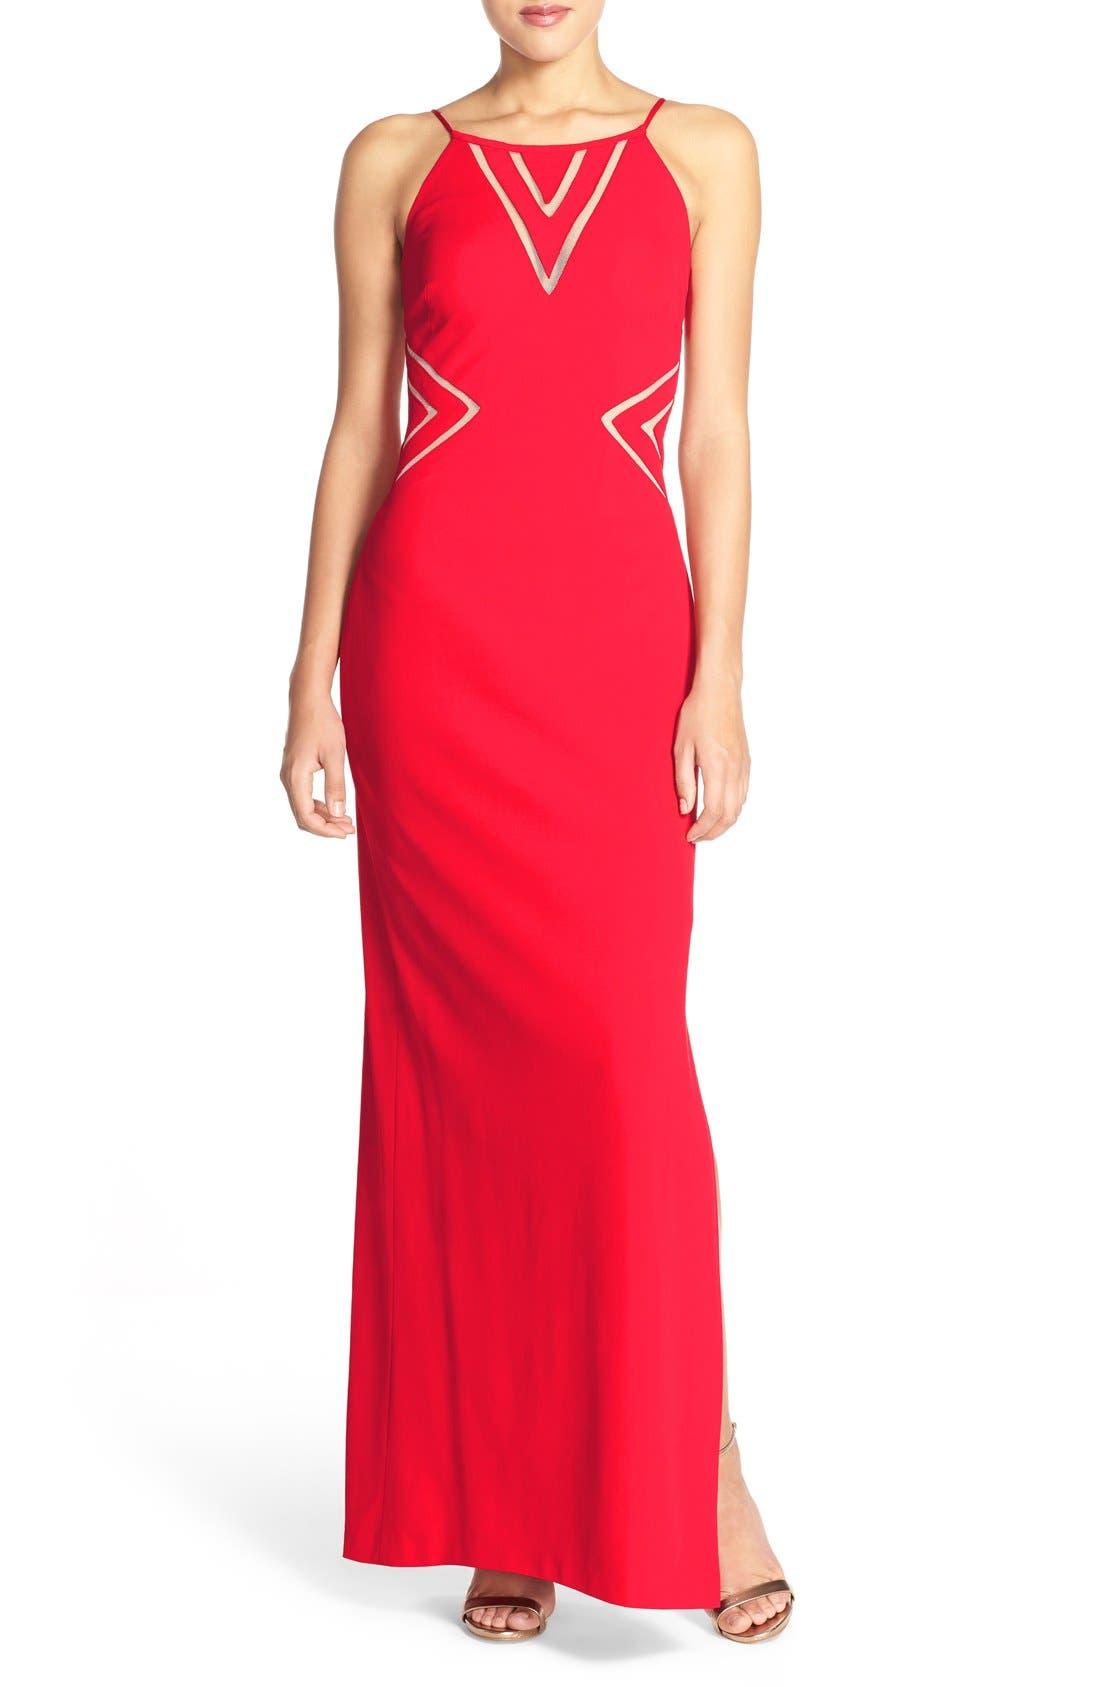 Alternate Image 1 Selected - Aidan Mattox Mesh Inset Jersey Gown